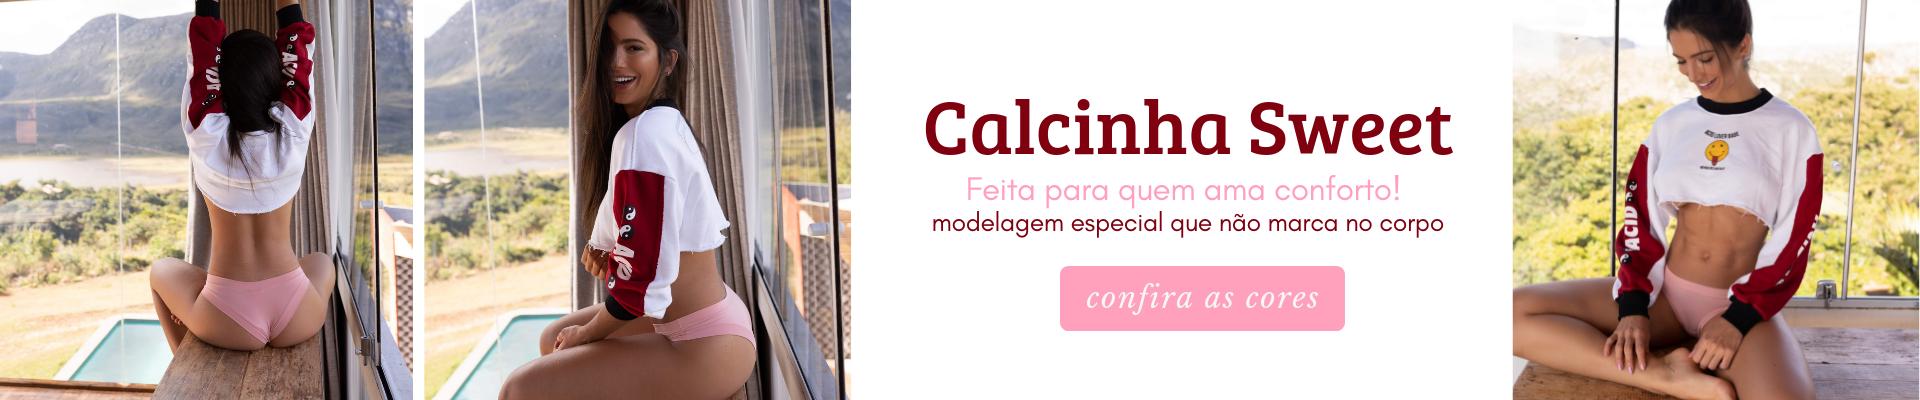 CALCINHA SWEET